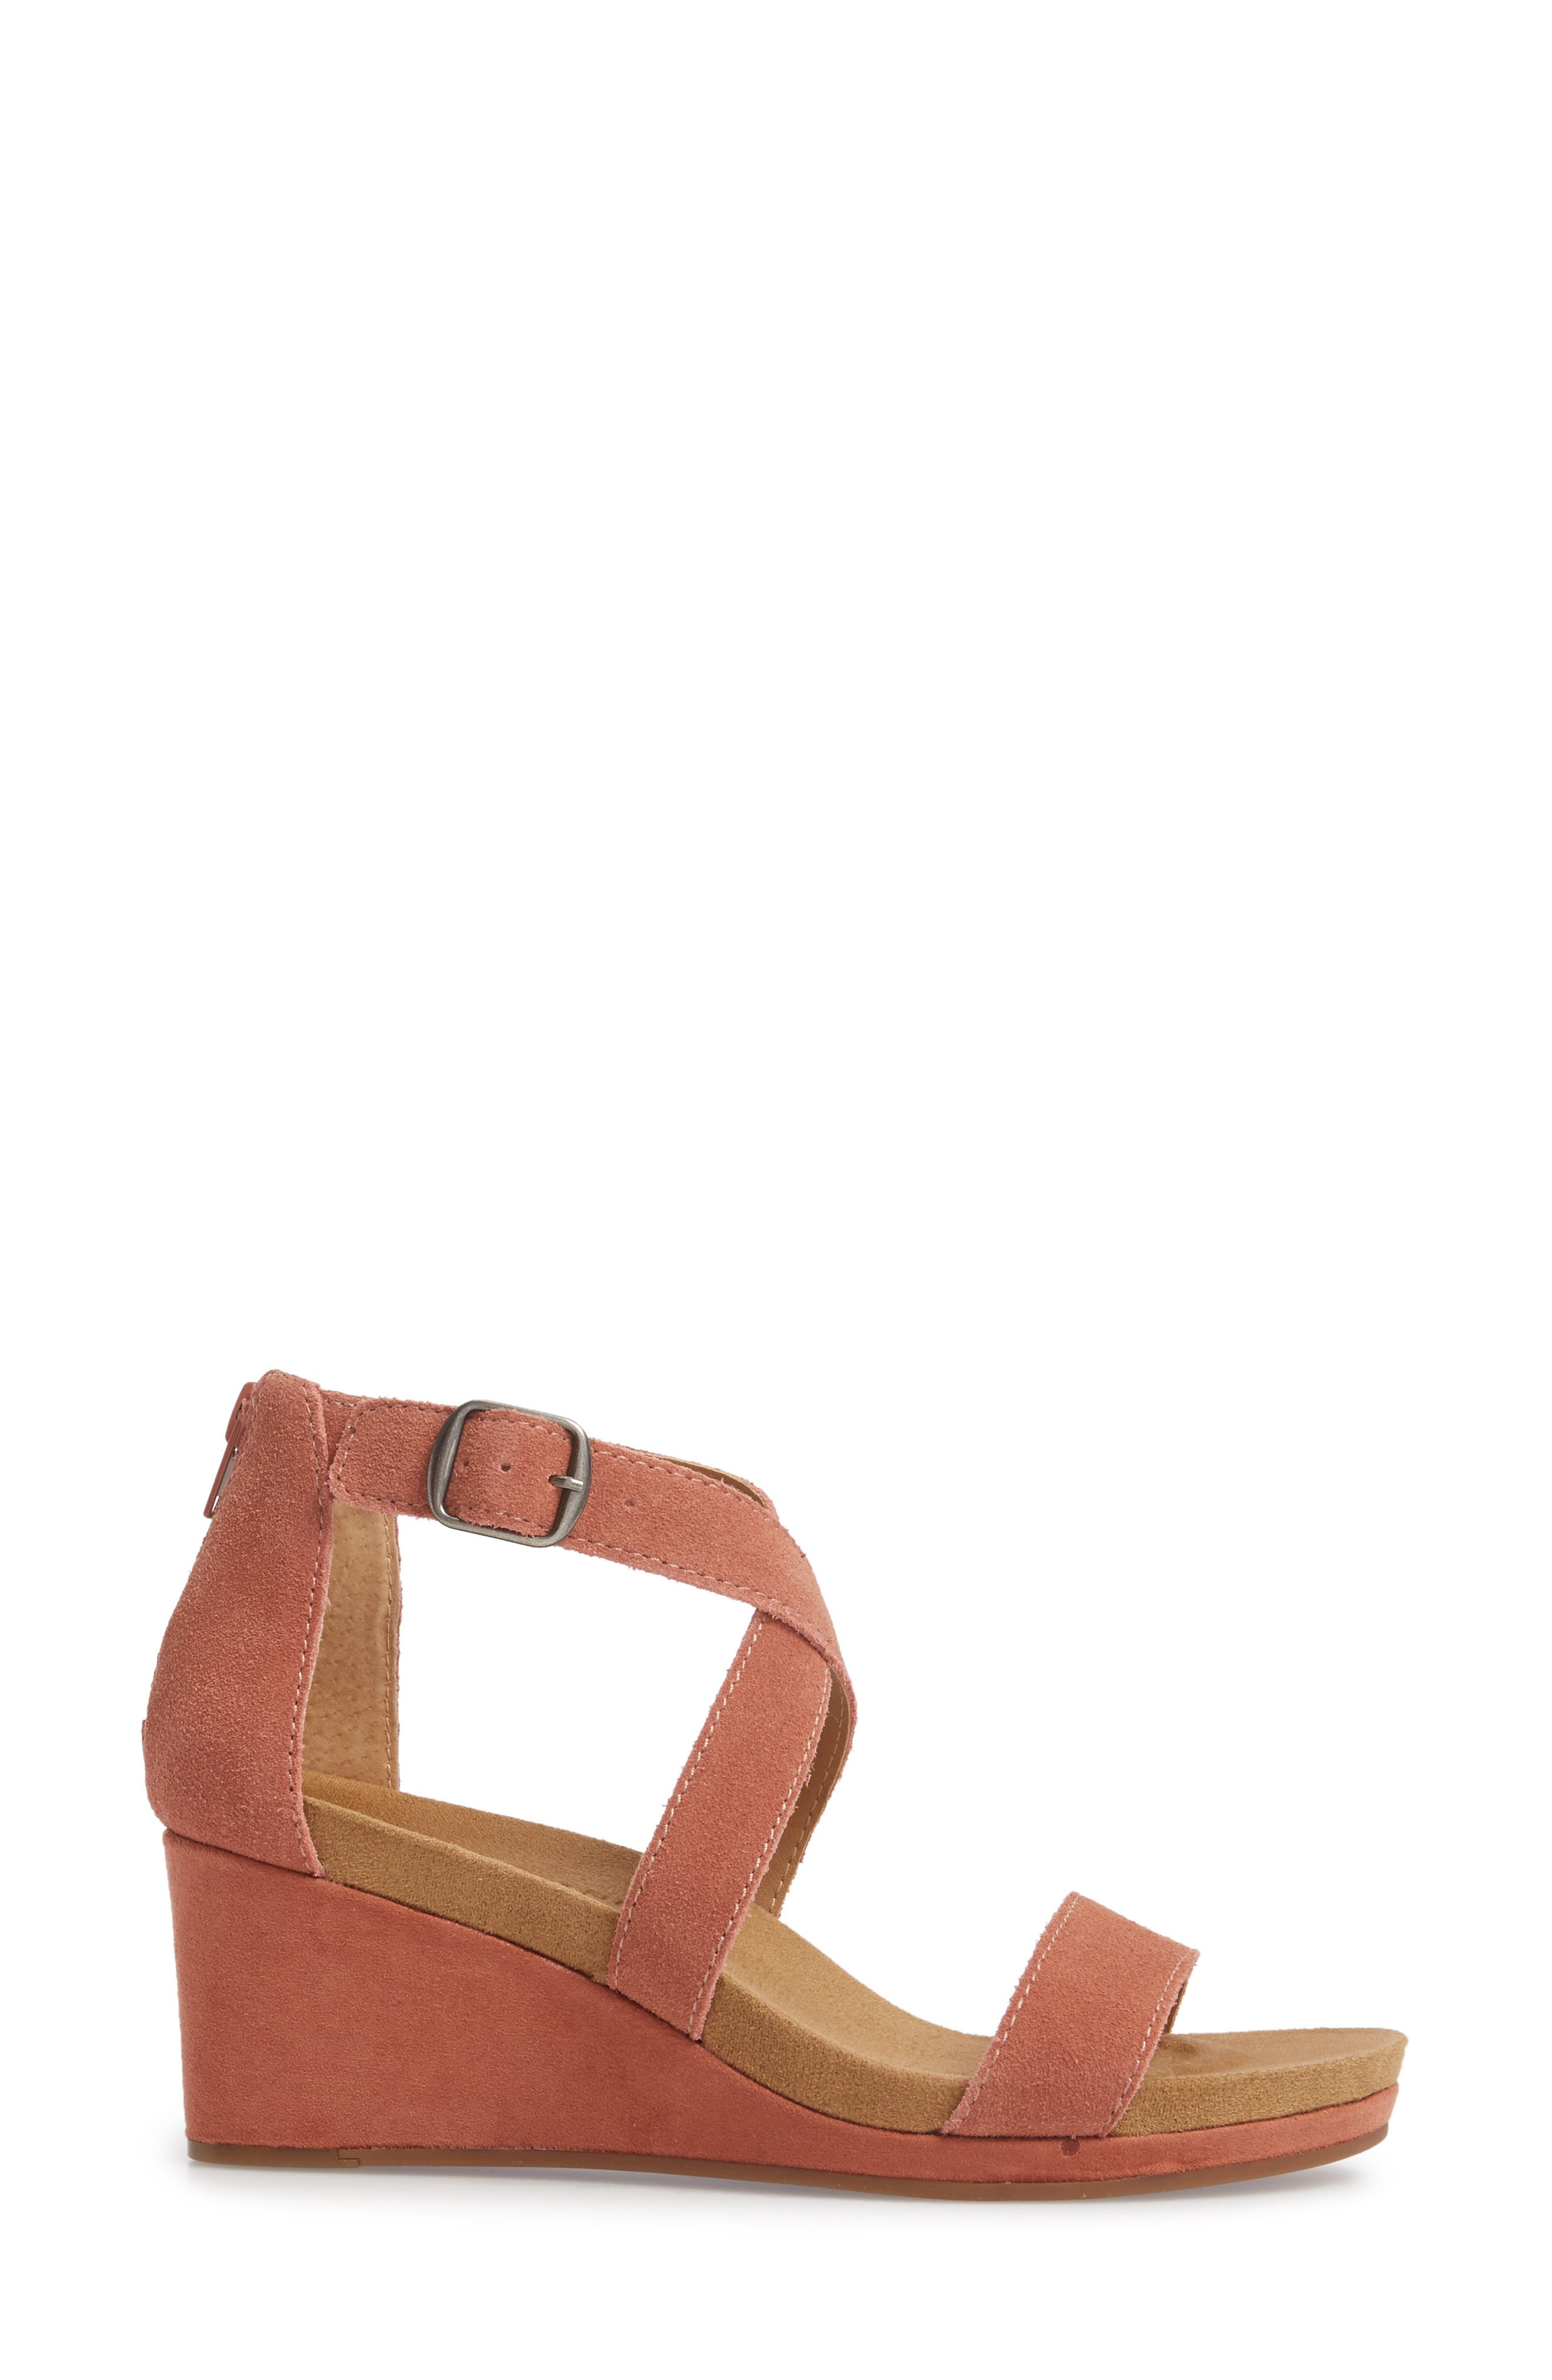 Kenadee Wedge Sandal,                             Alternate thumbnail 3, color,                             Canyon Rose Suede